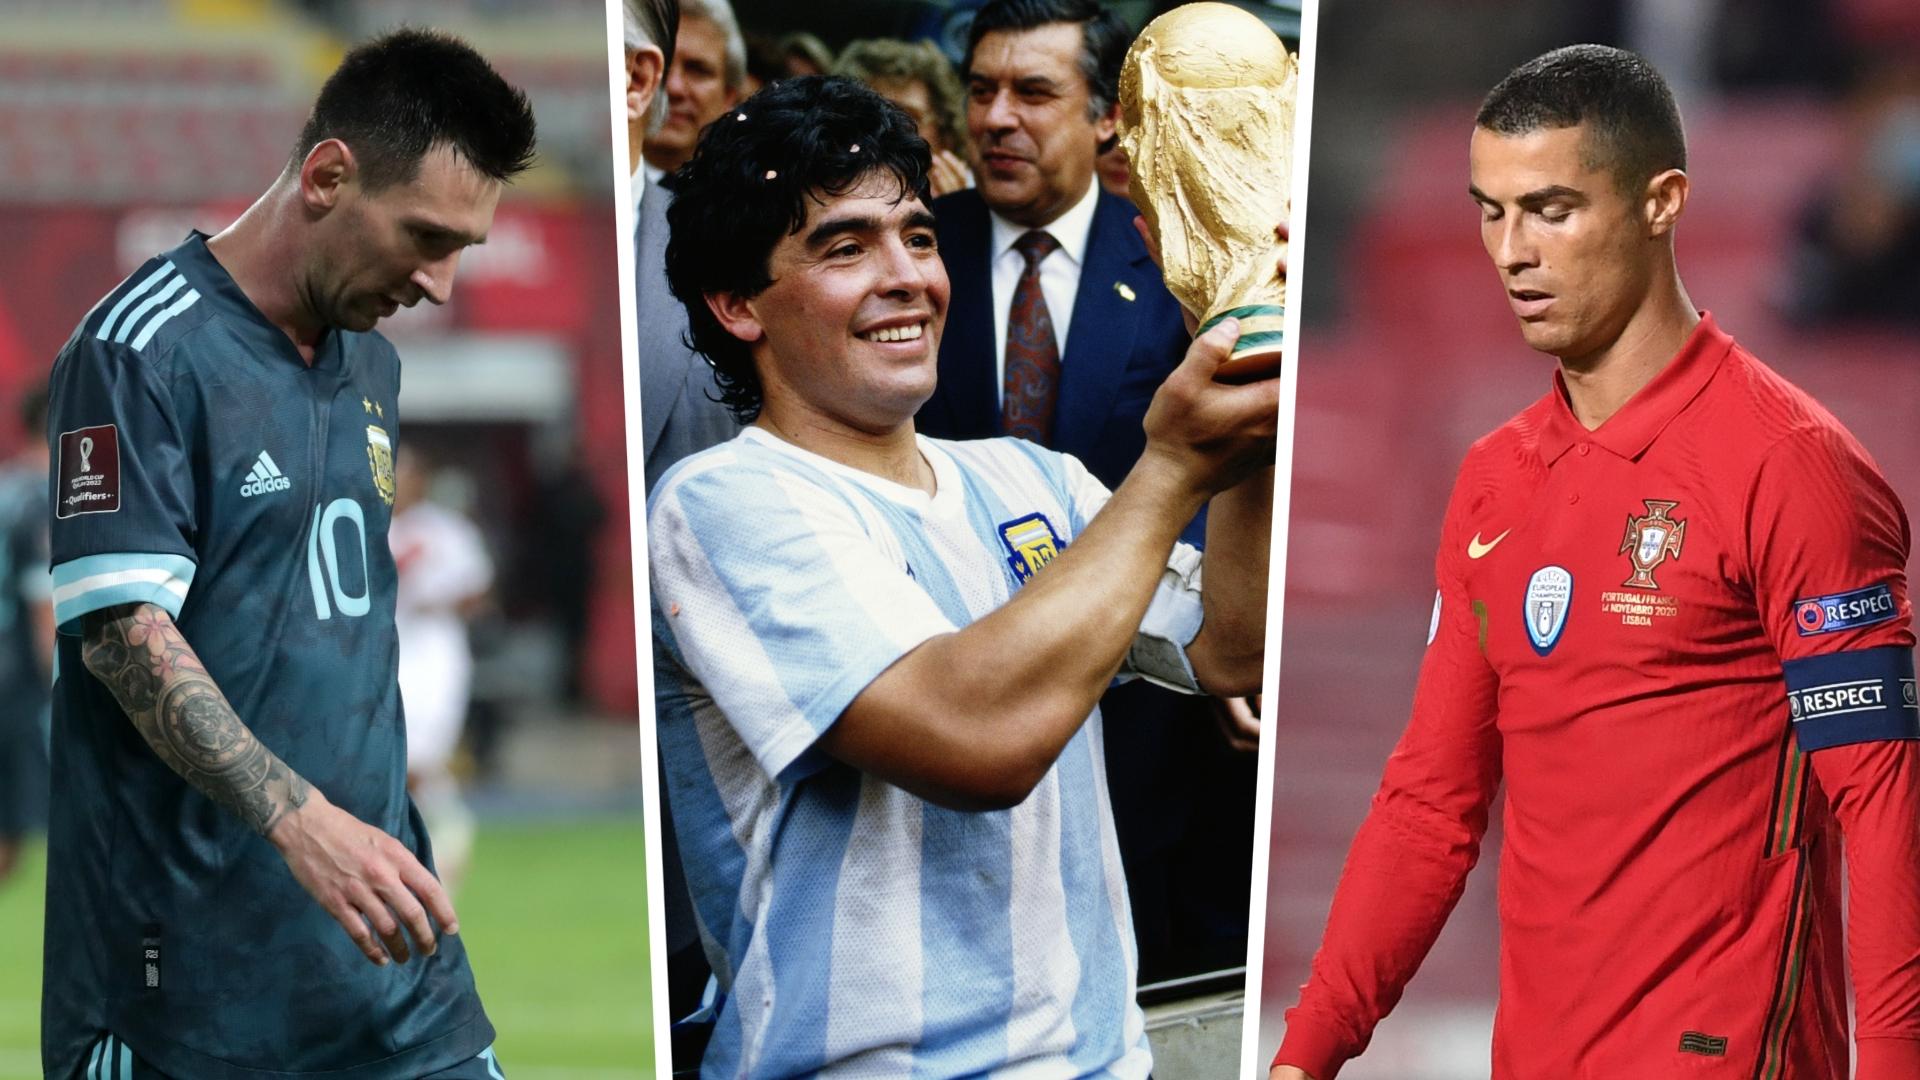 Cristiano Ronaldo Beats Messi, Lewandoski to Win 2020 Golden Foot Award